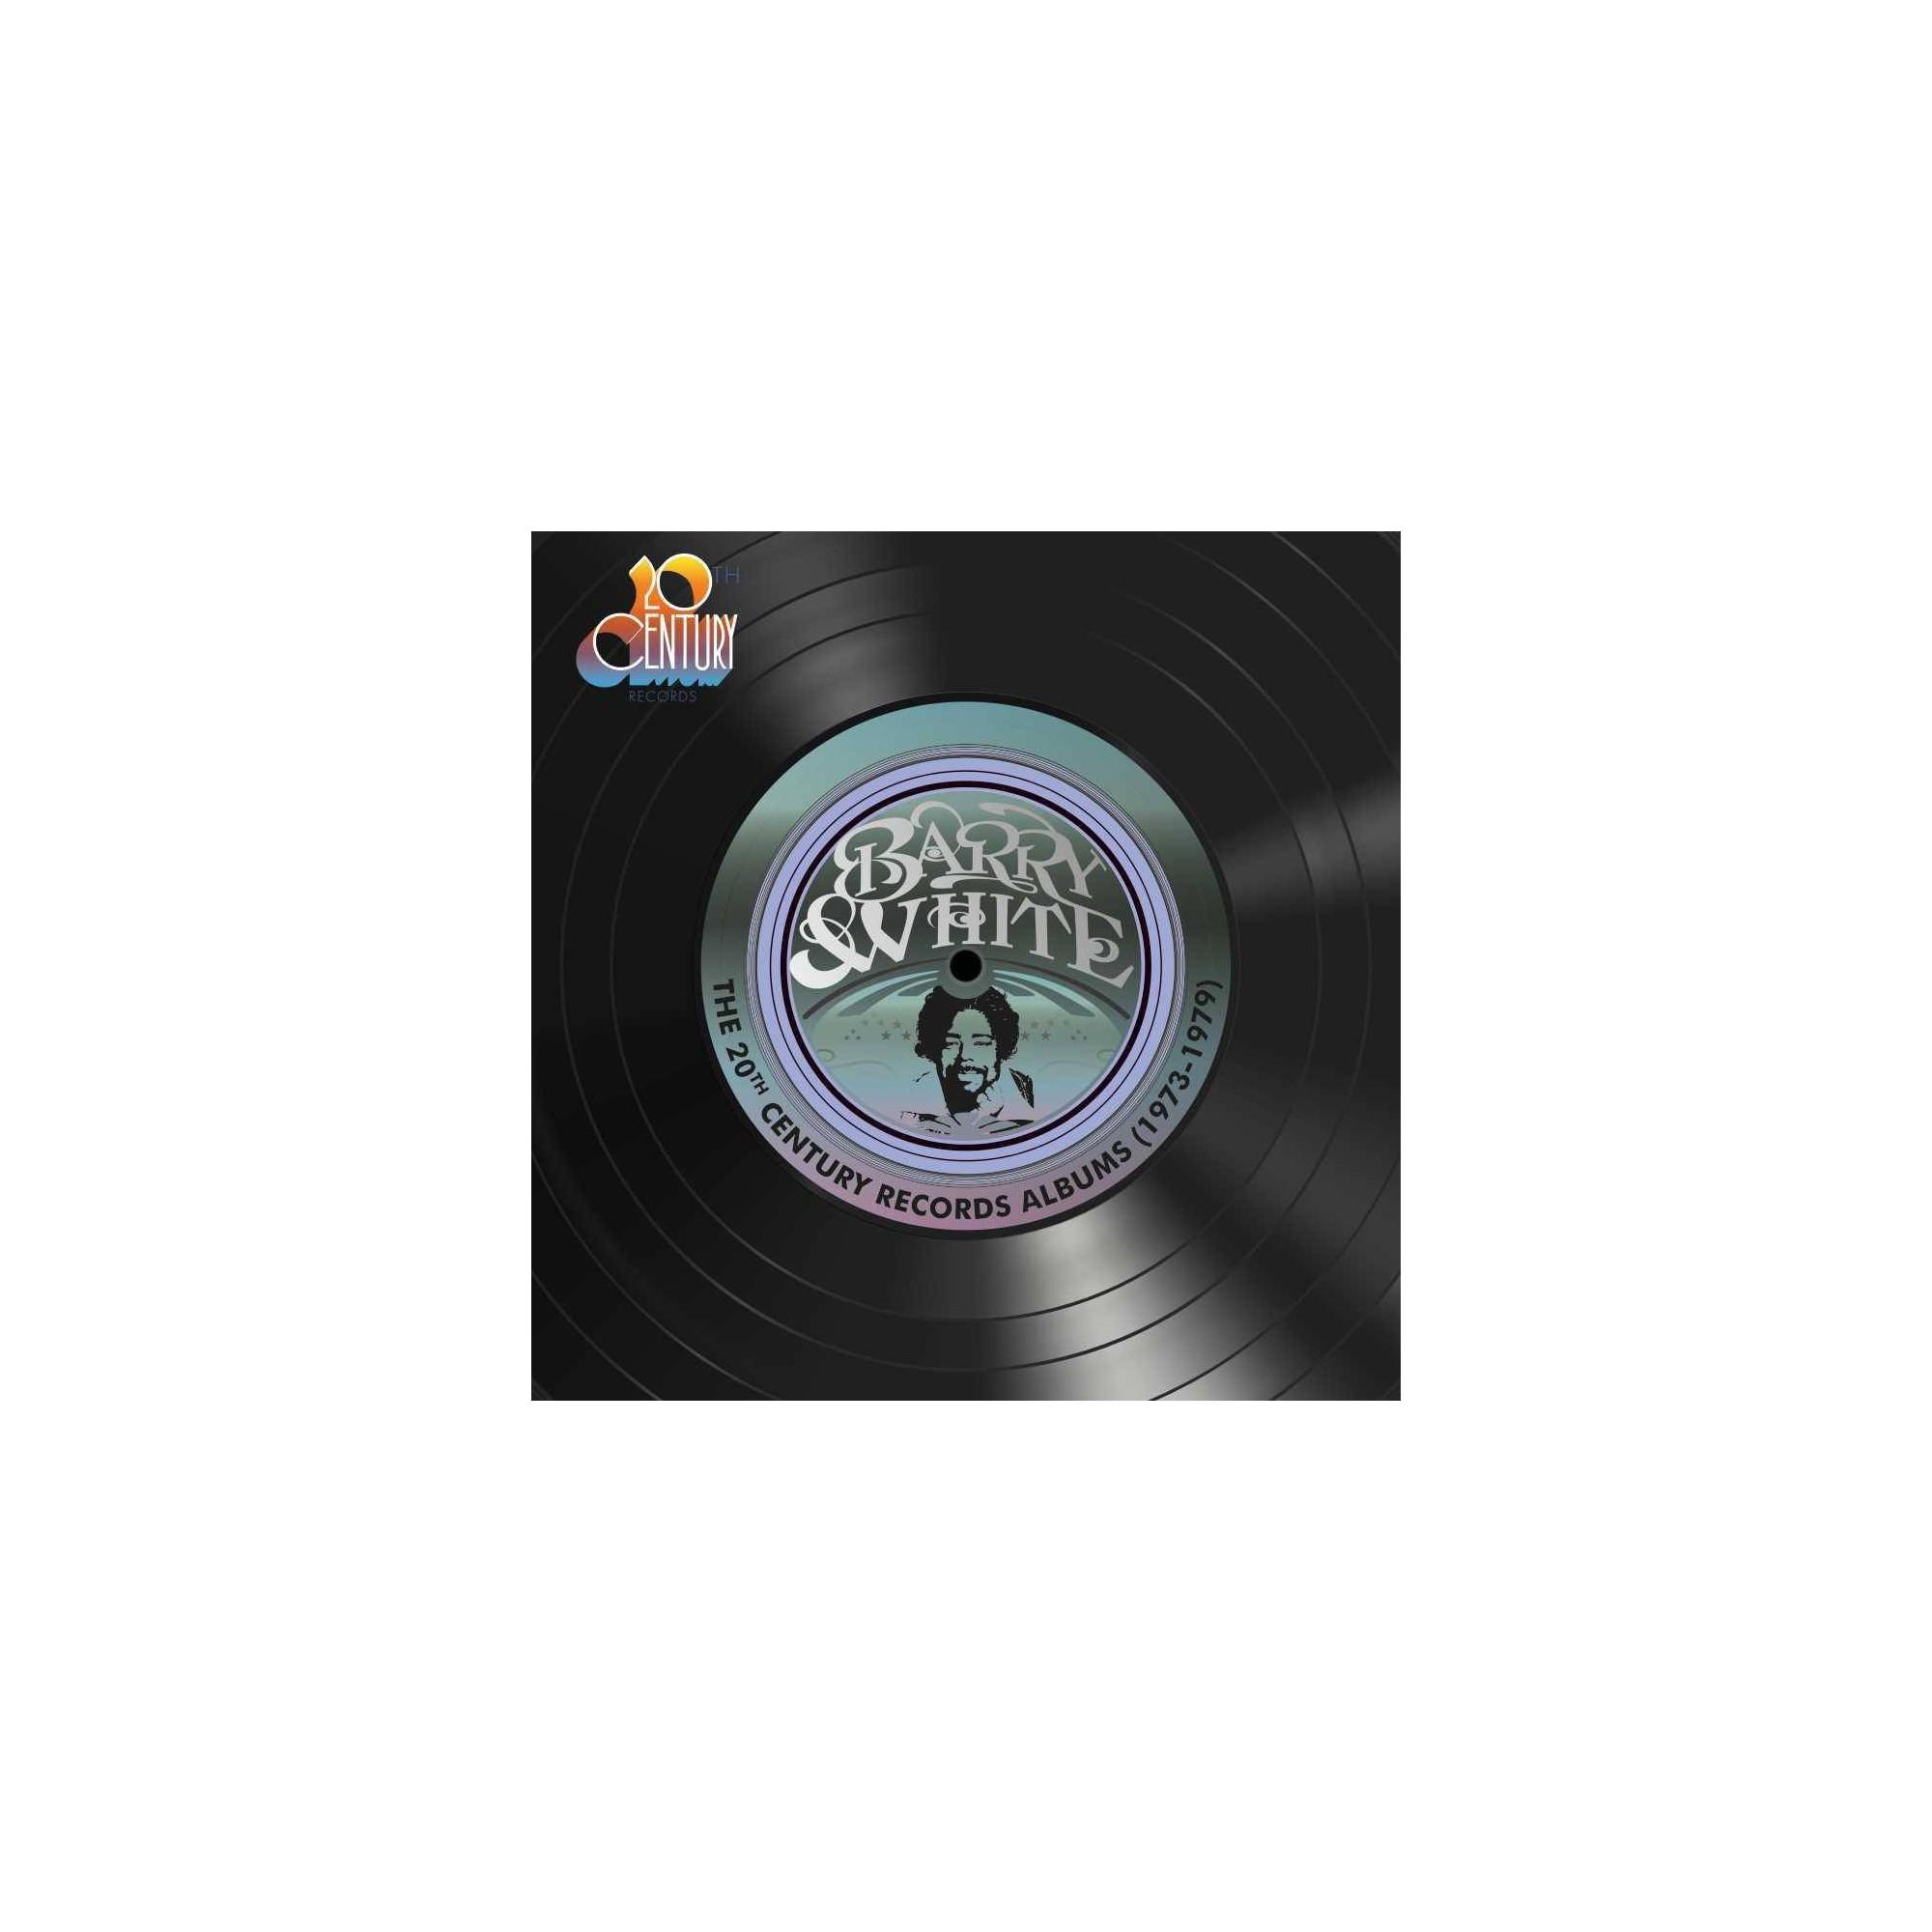 Barry White 20th Century Records Albums 1973 1979 Vinyl